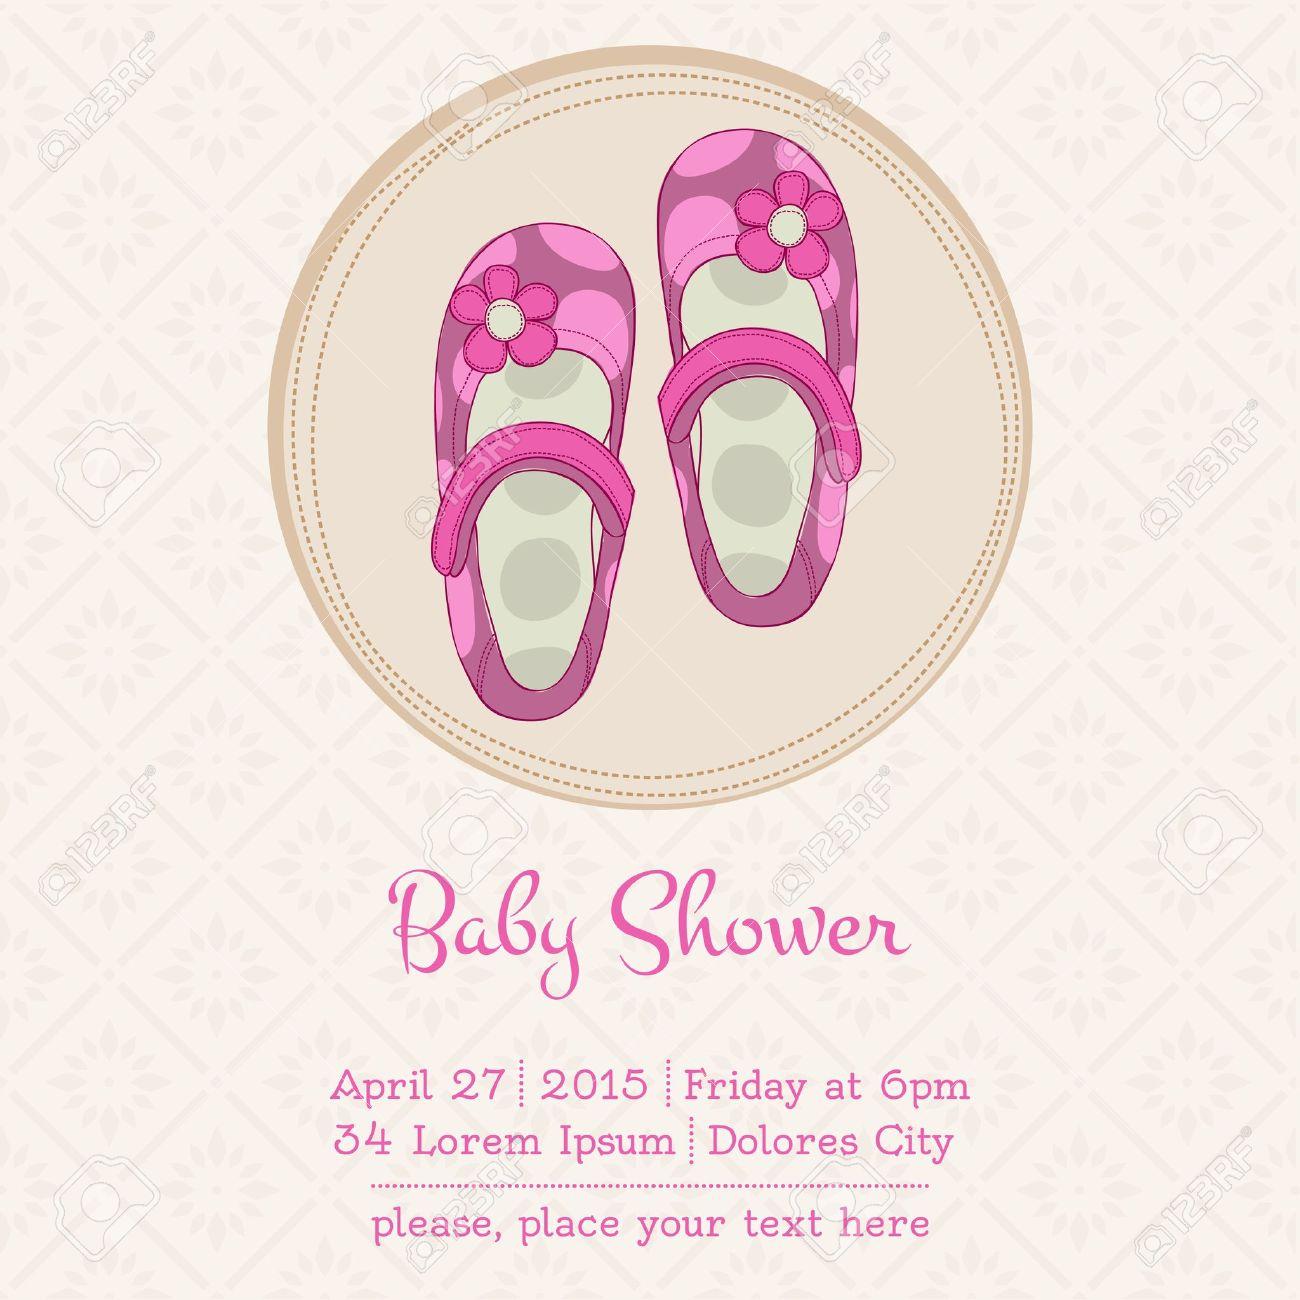 Baby Shower Karte Text.Stock Photo